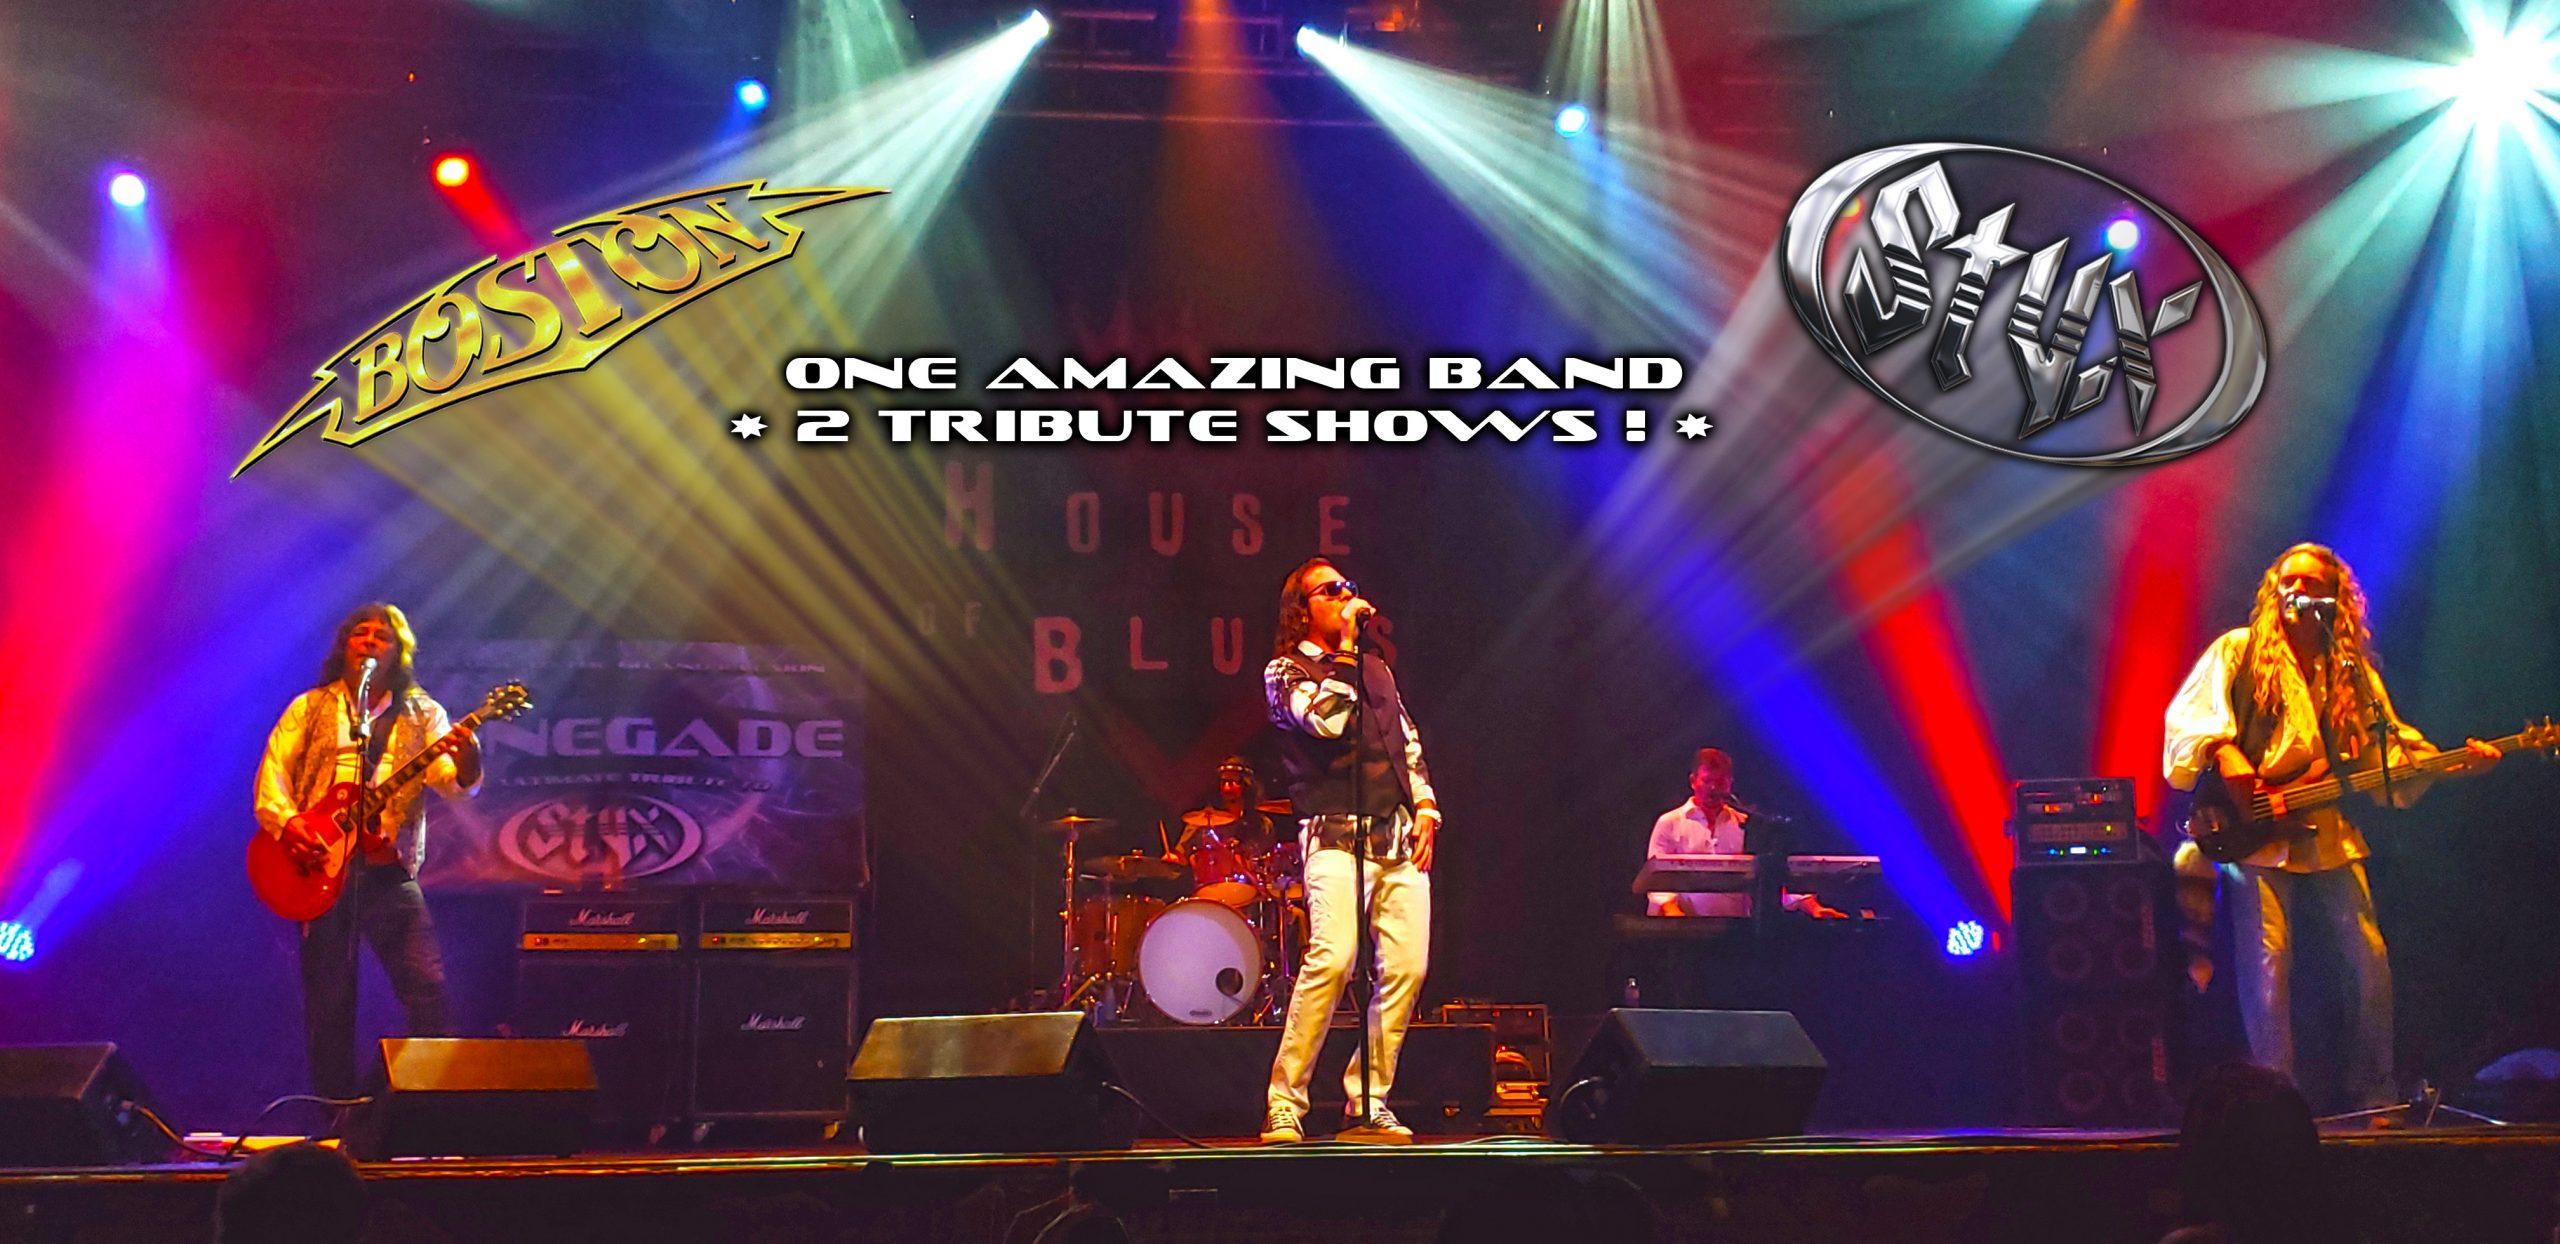 Destiny of Rock (Boston/Styx Tribute)